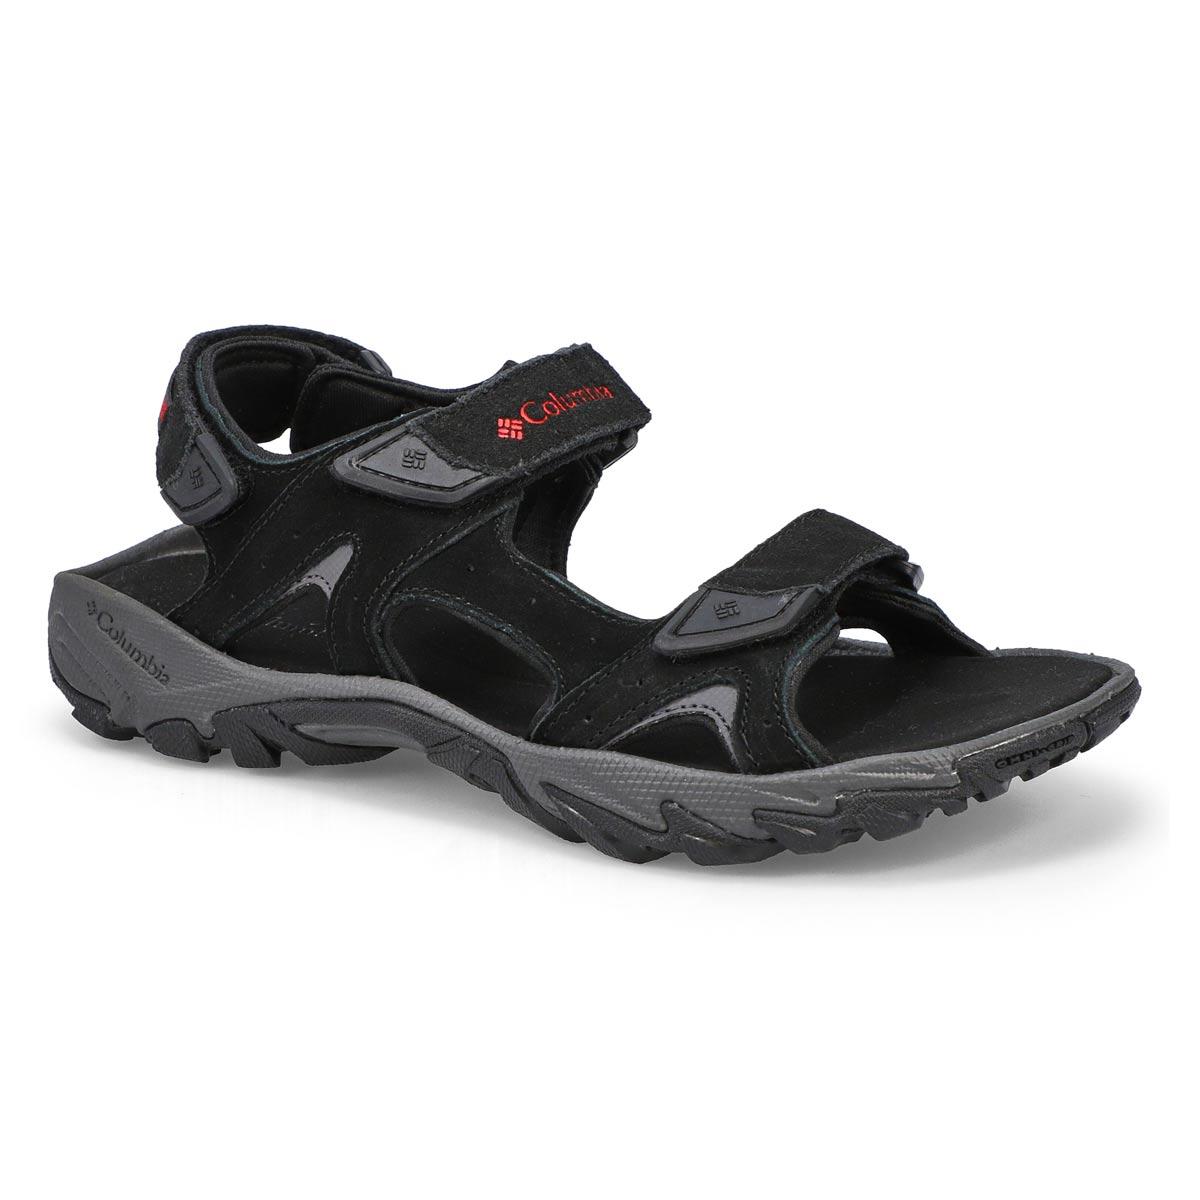 Men's Santiam Sport Sandal - Black/Red